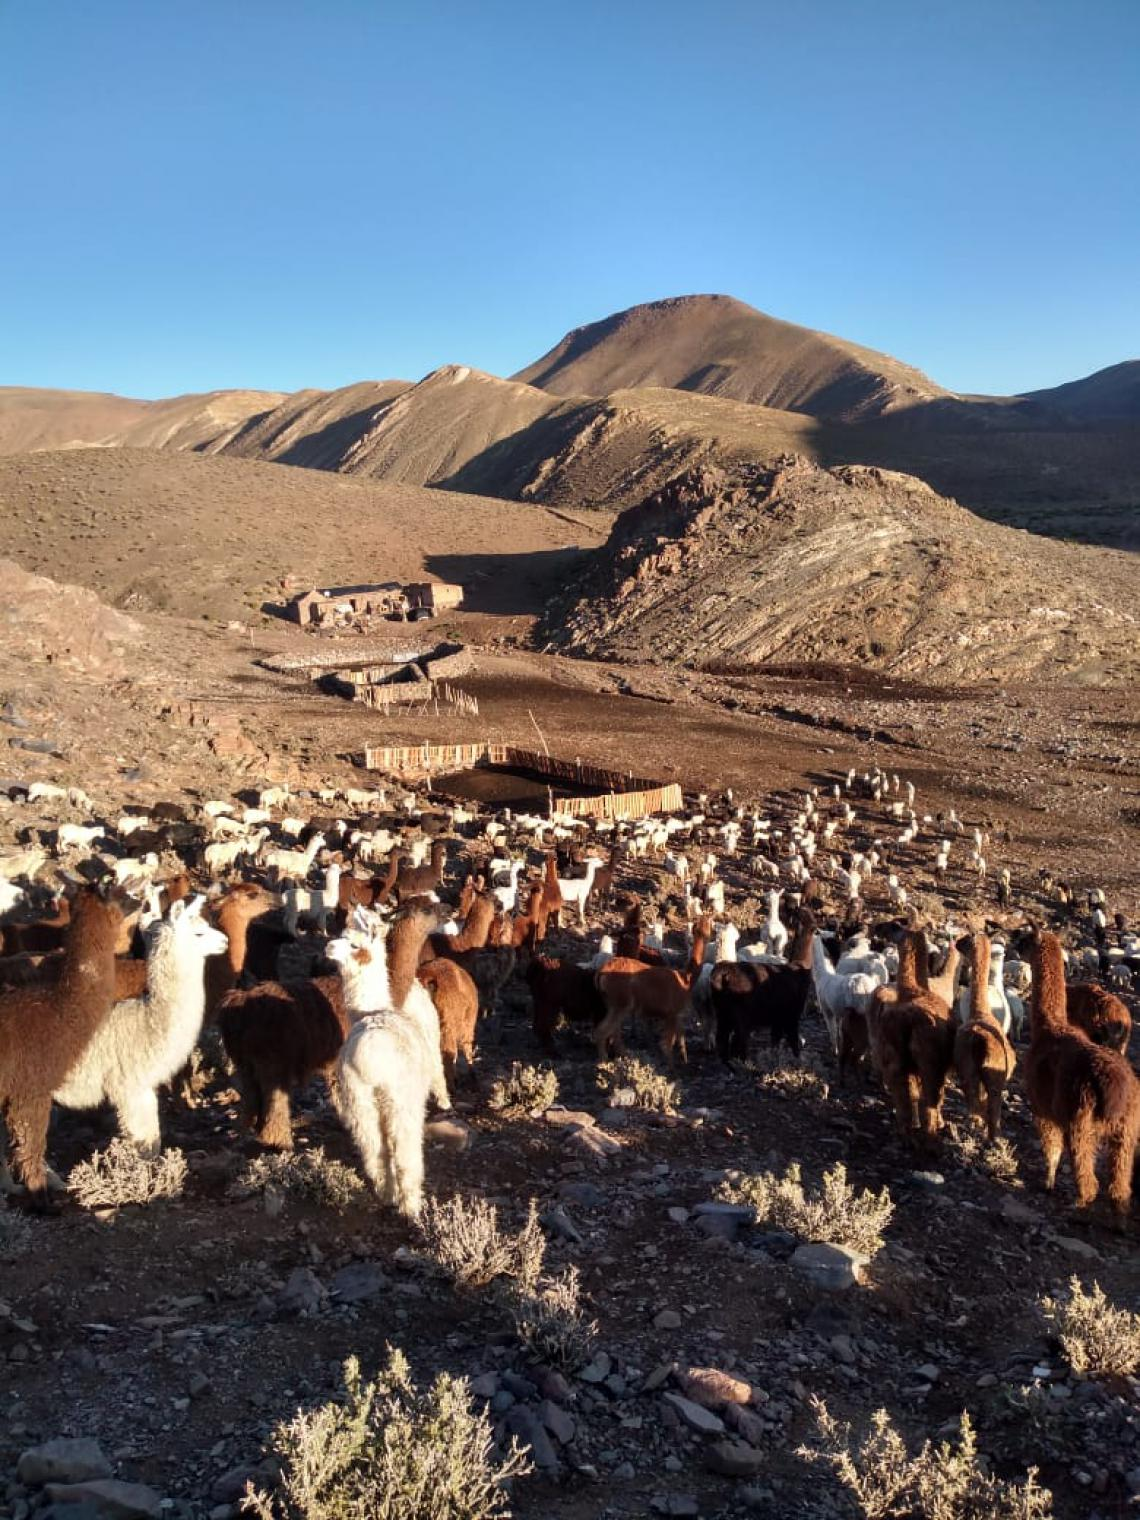 Herd in mountains